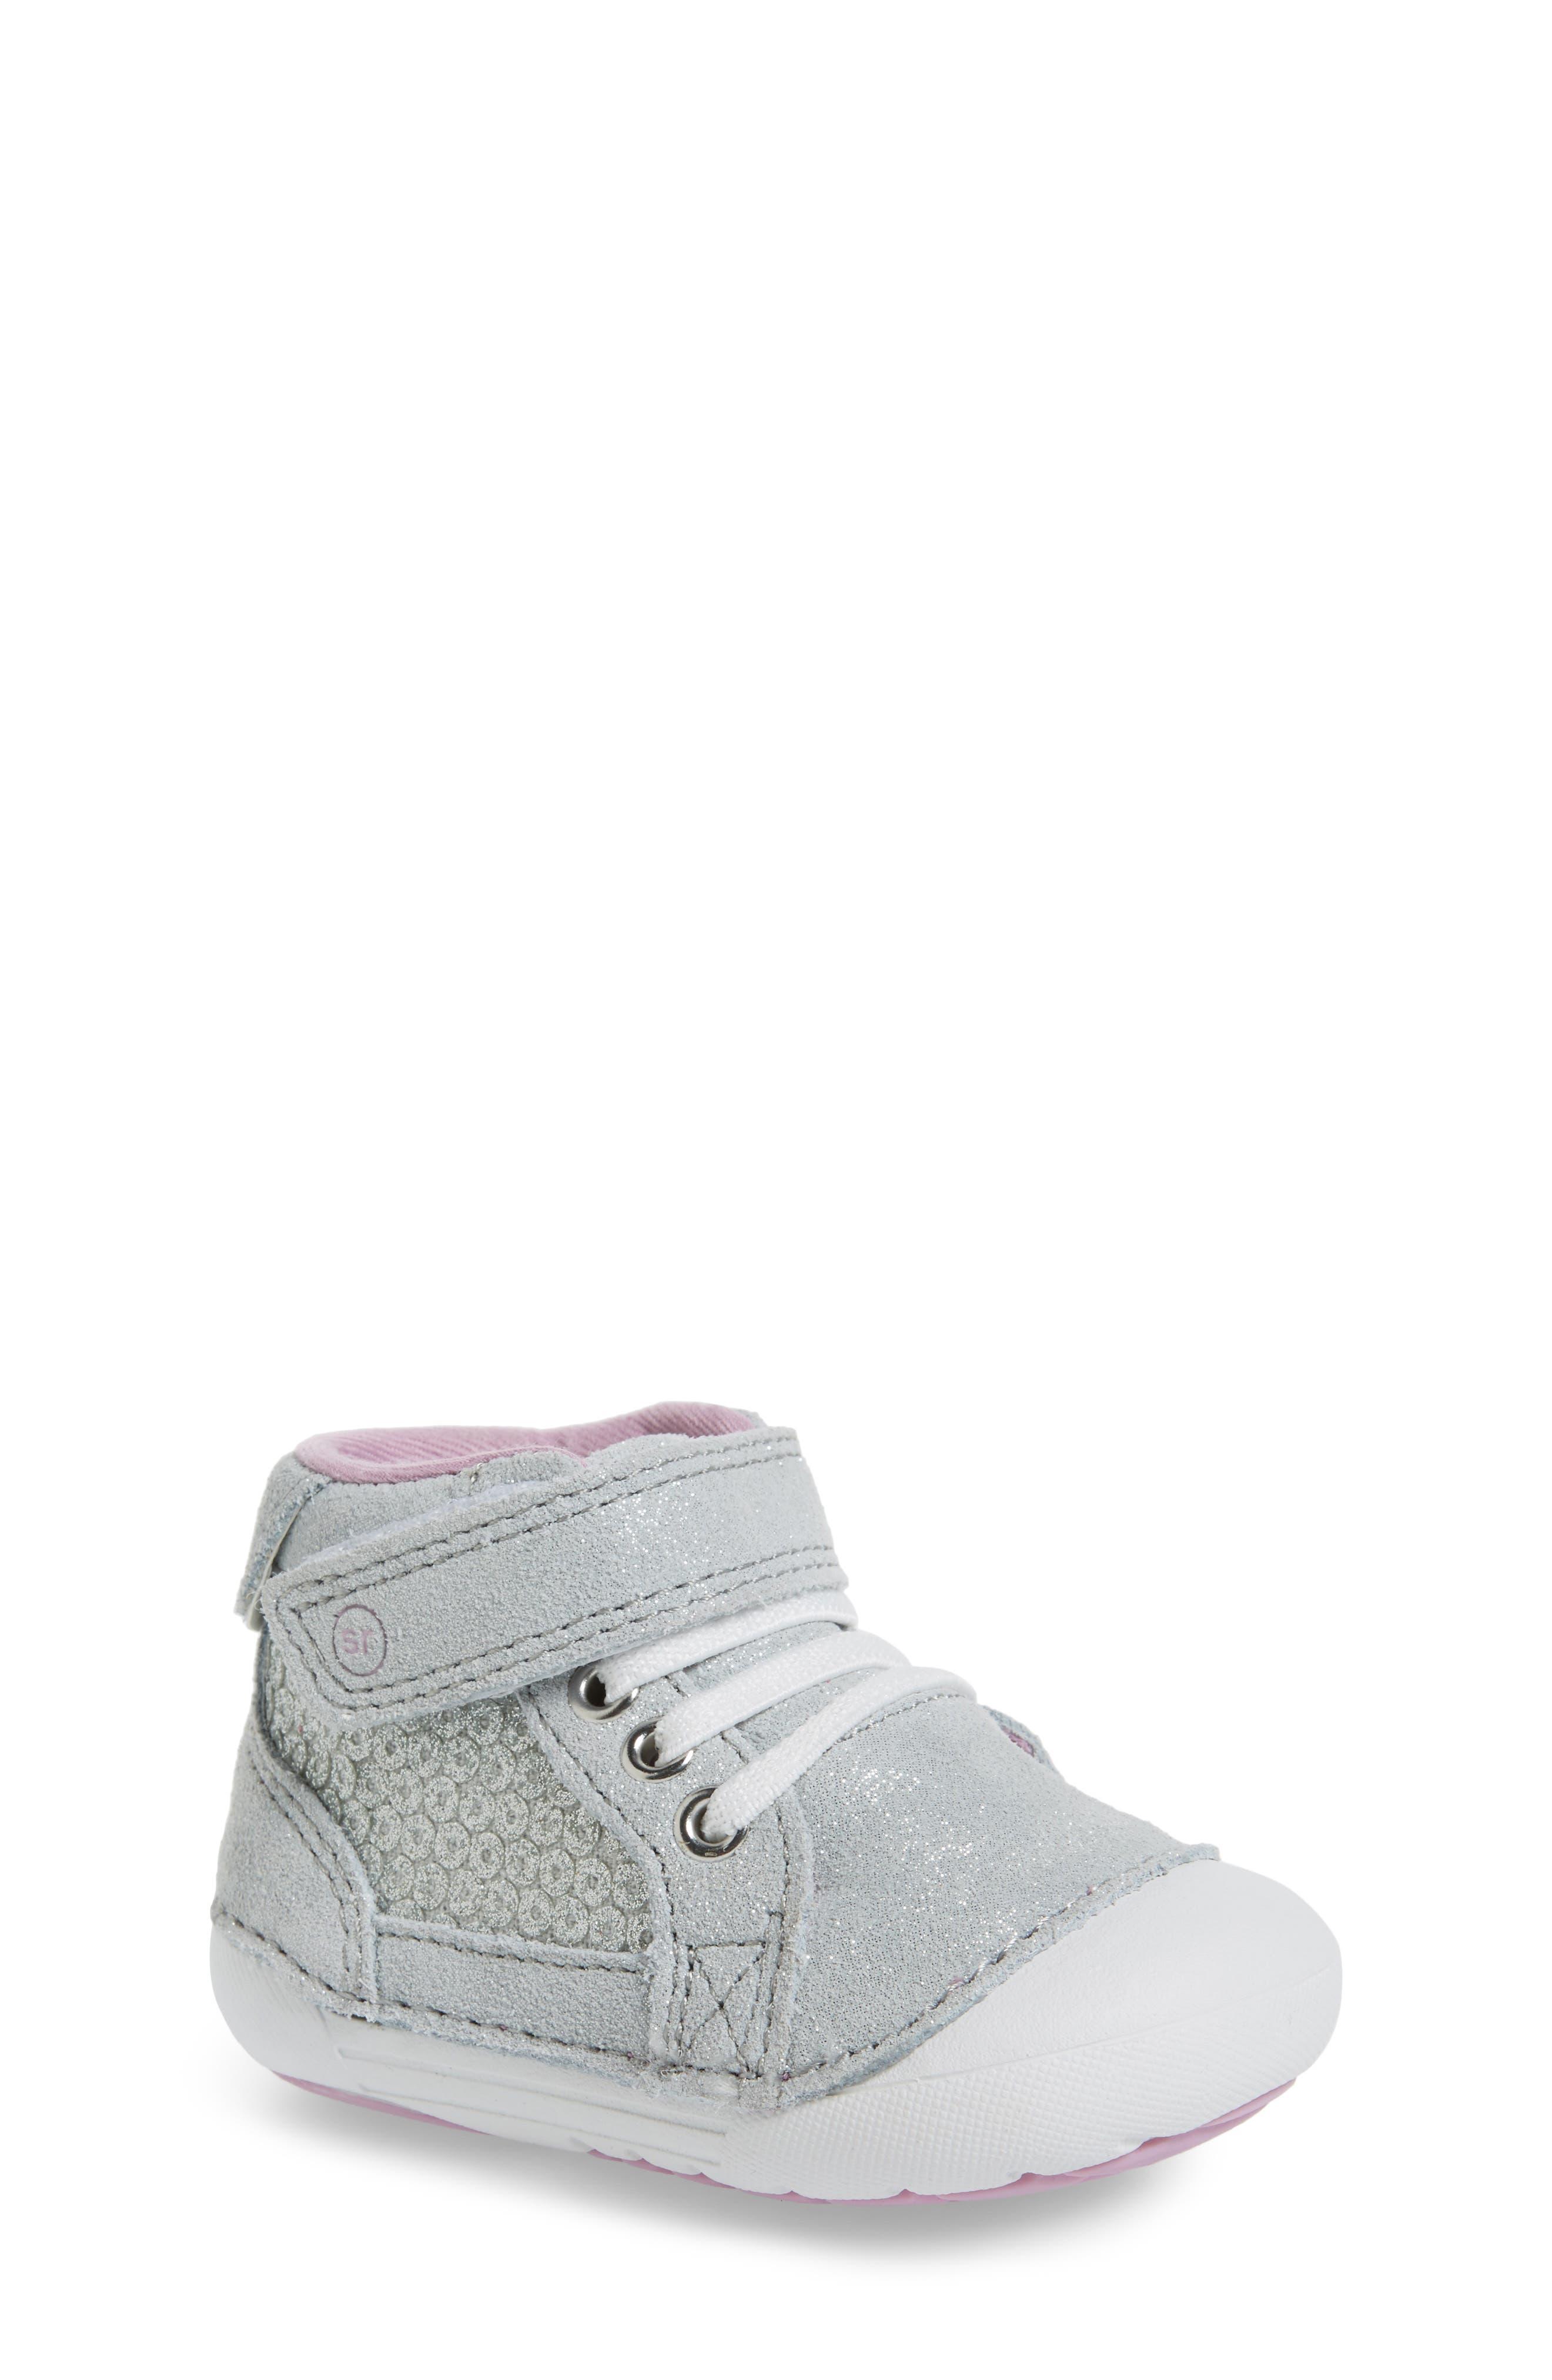 STRIDE RITE Soft Motion<sup>™</sup> Jada High Top Sneaker